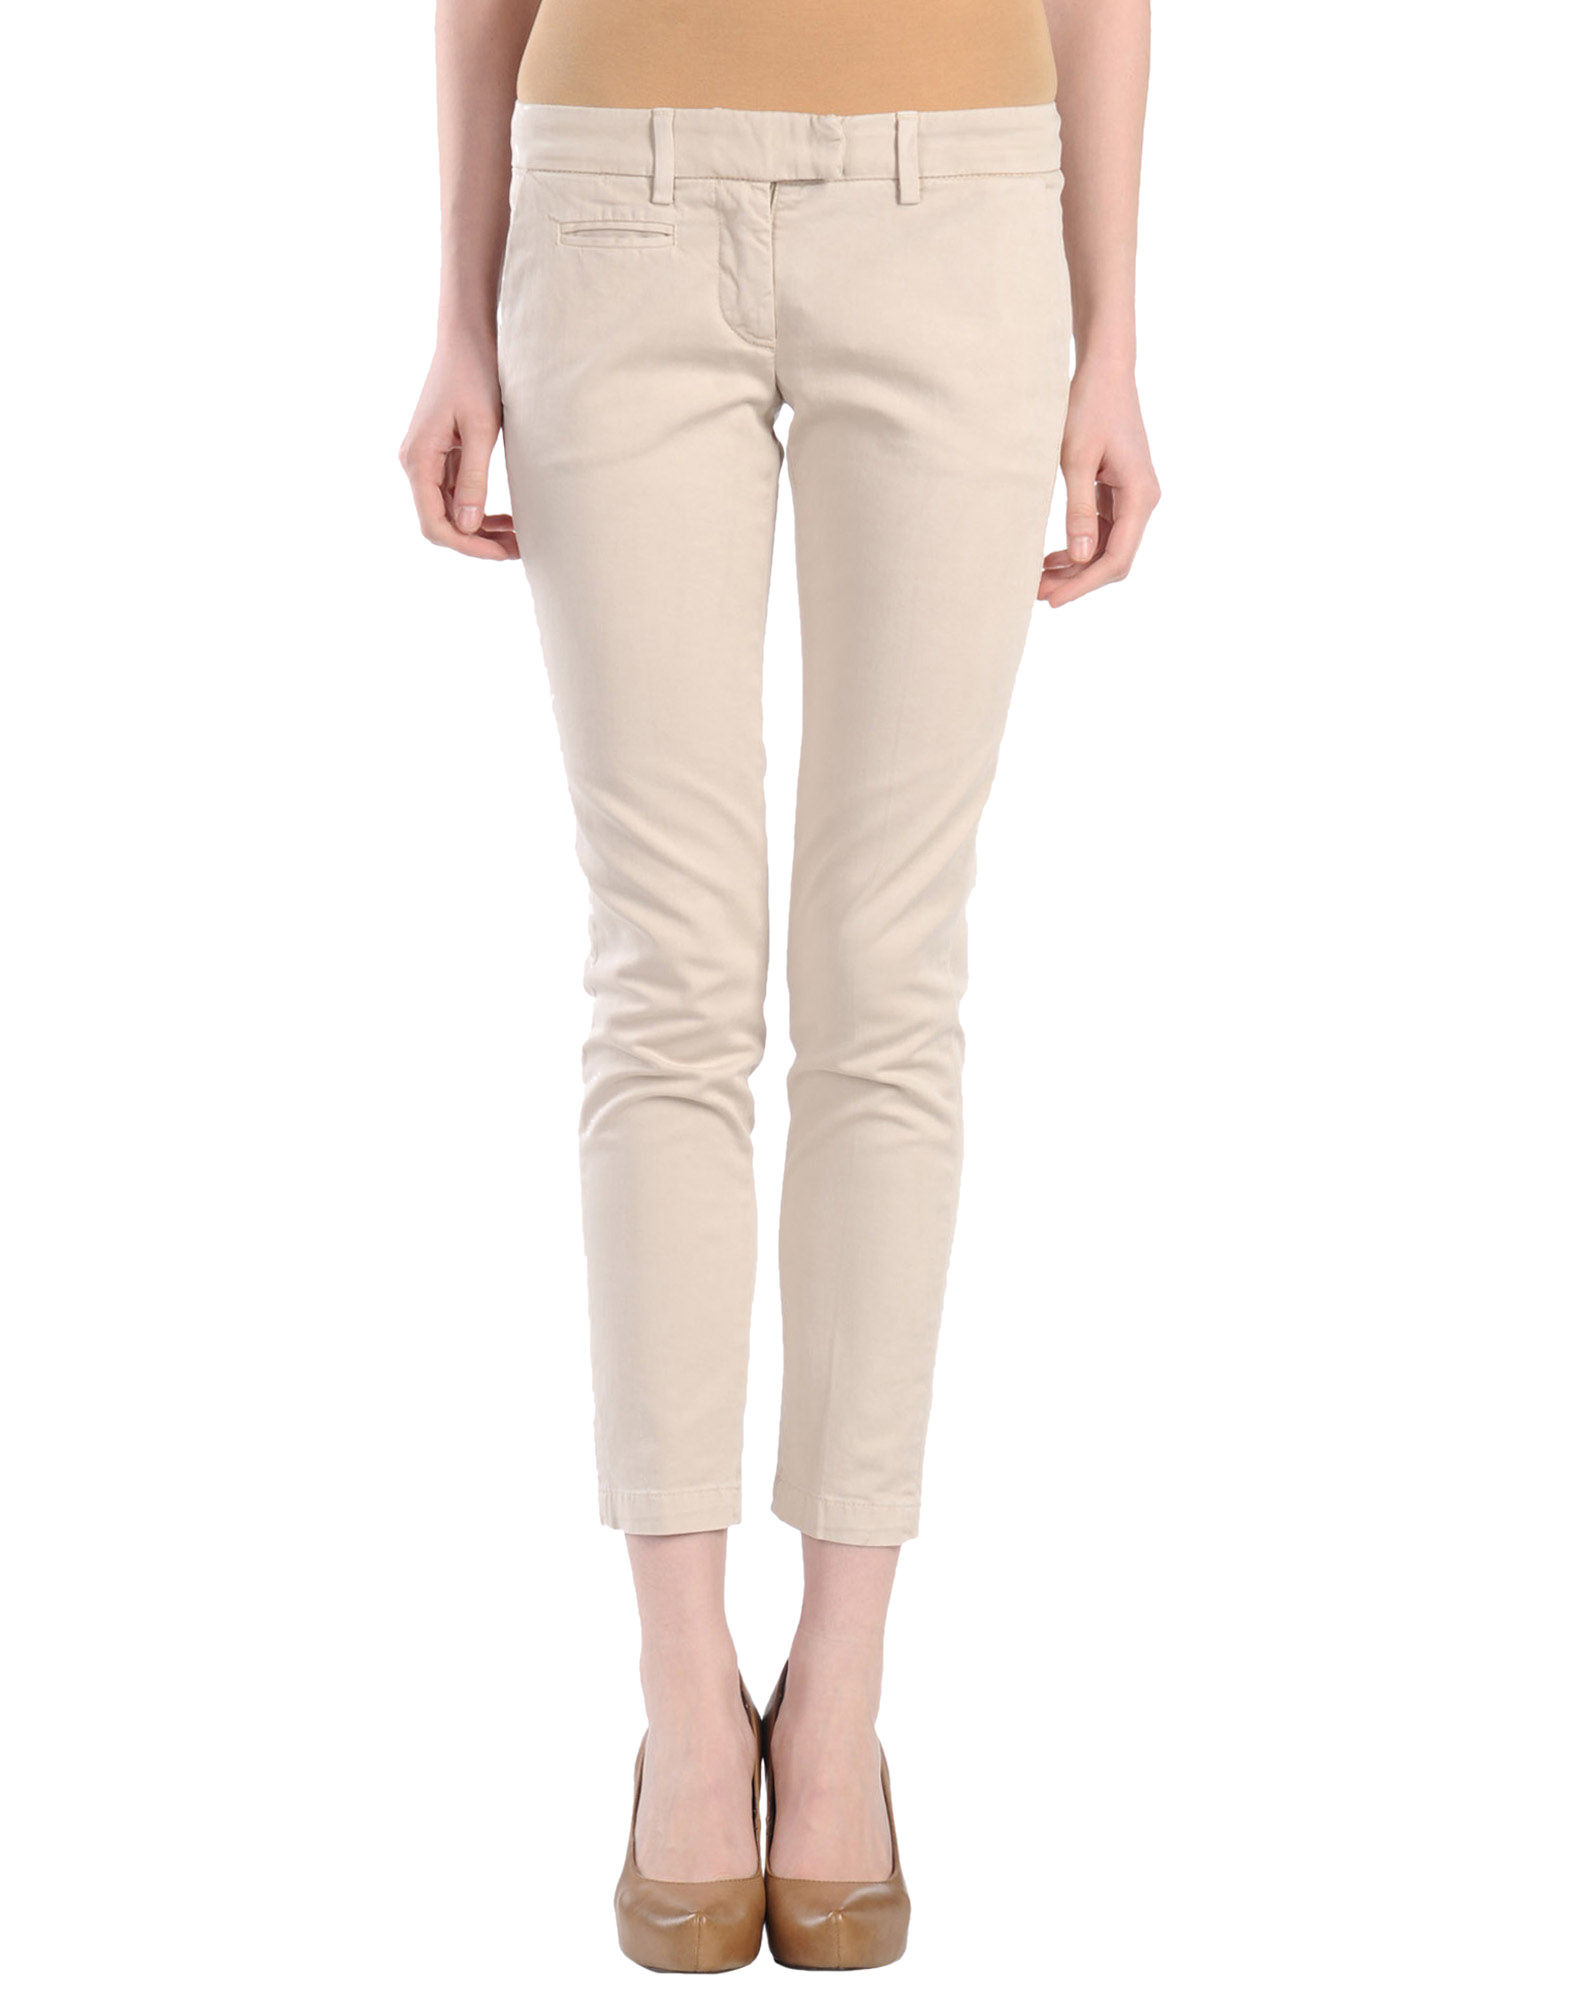 Original Womens Navy Khaki Pants  Dis Pants